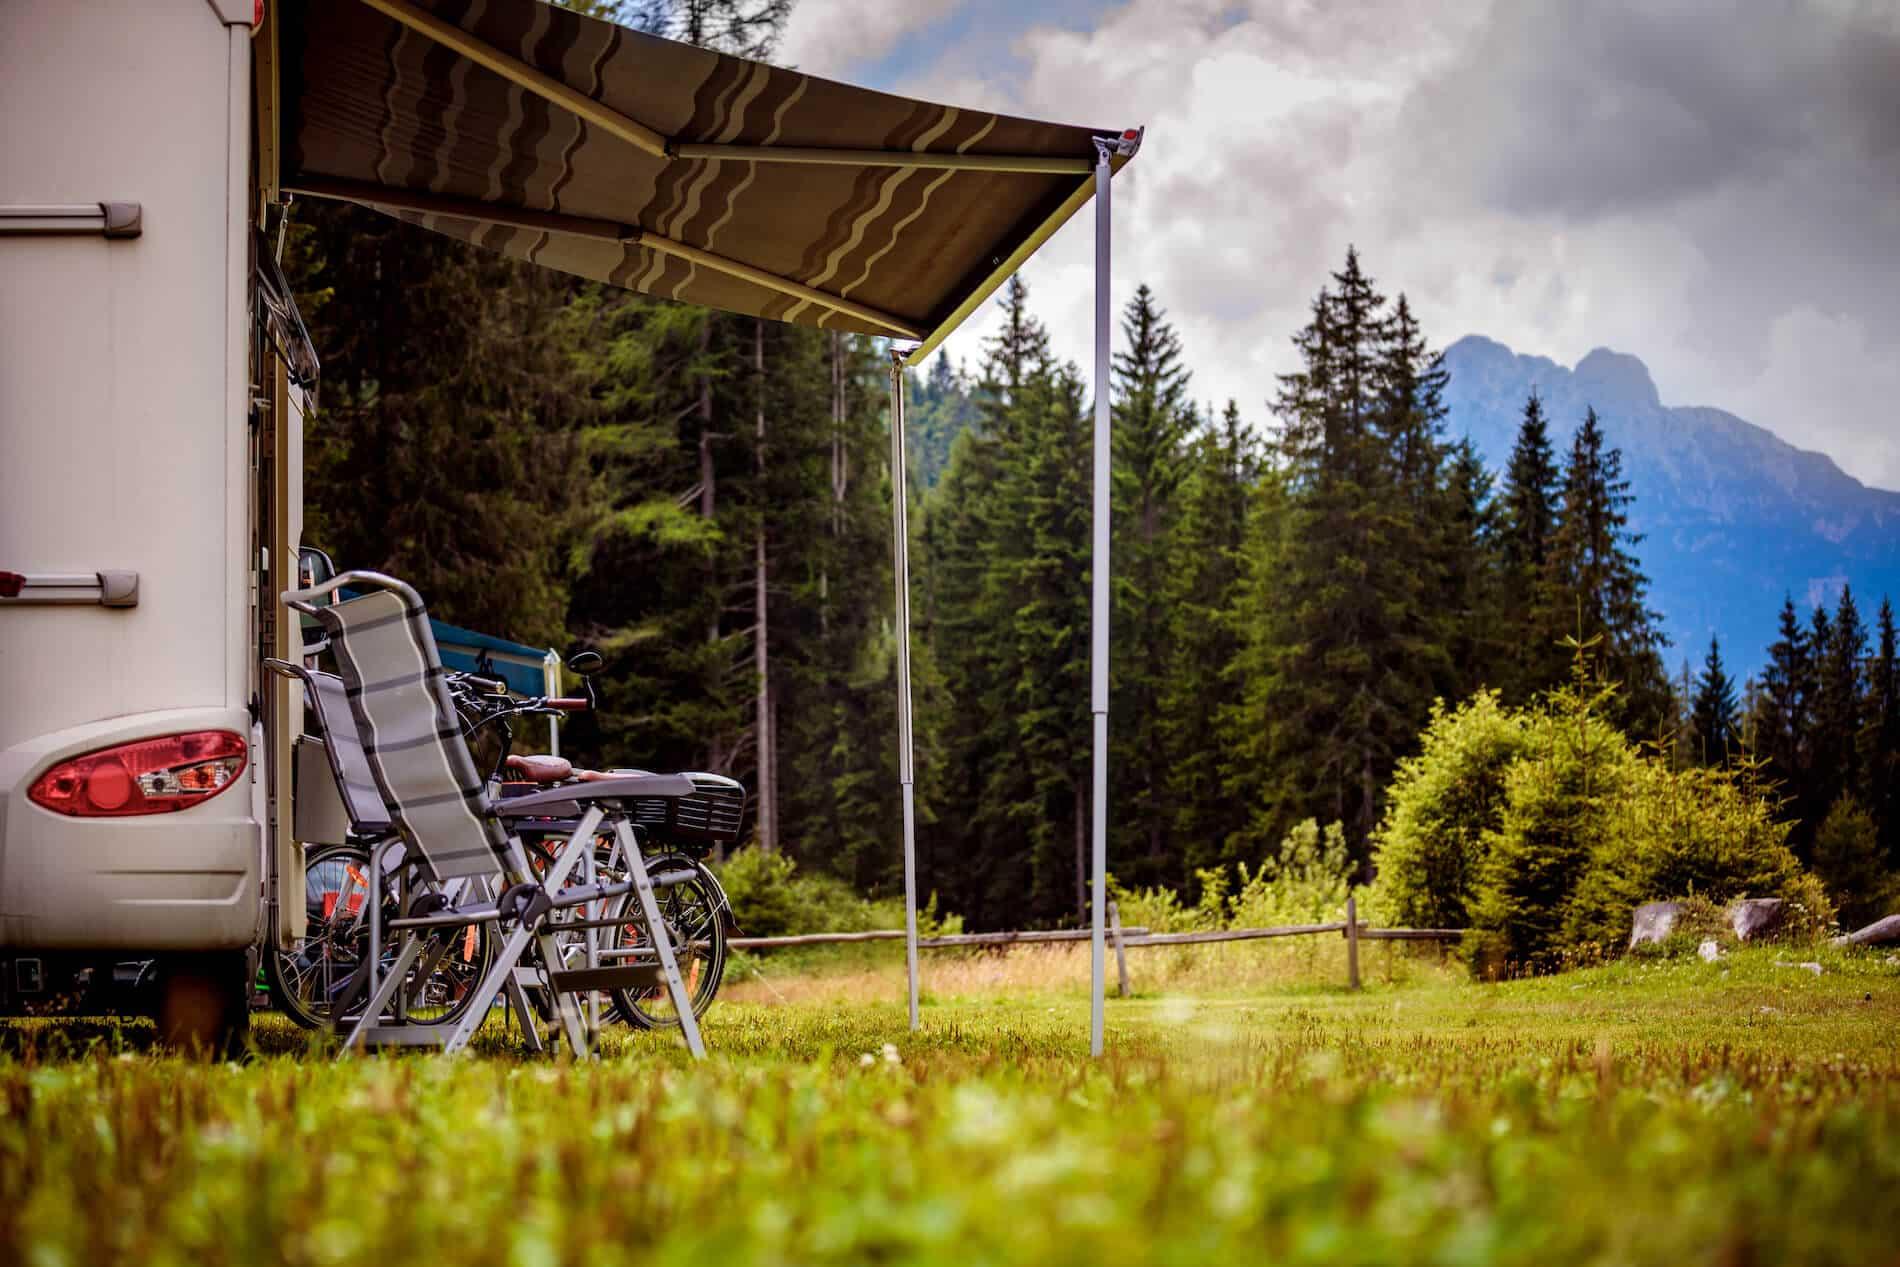 Summer camping plans